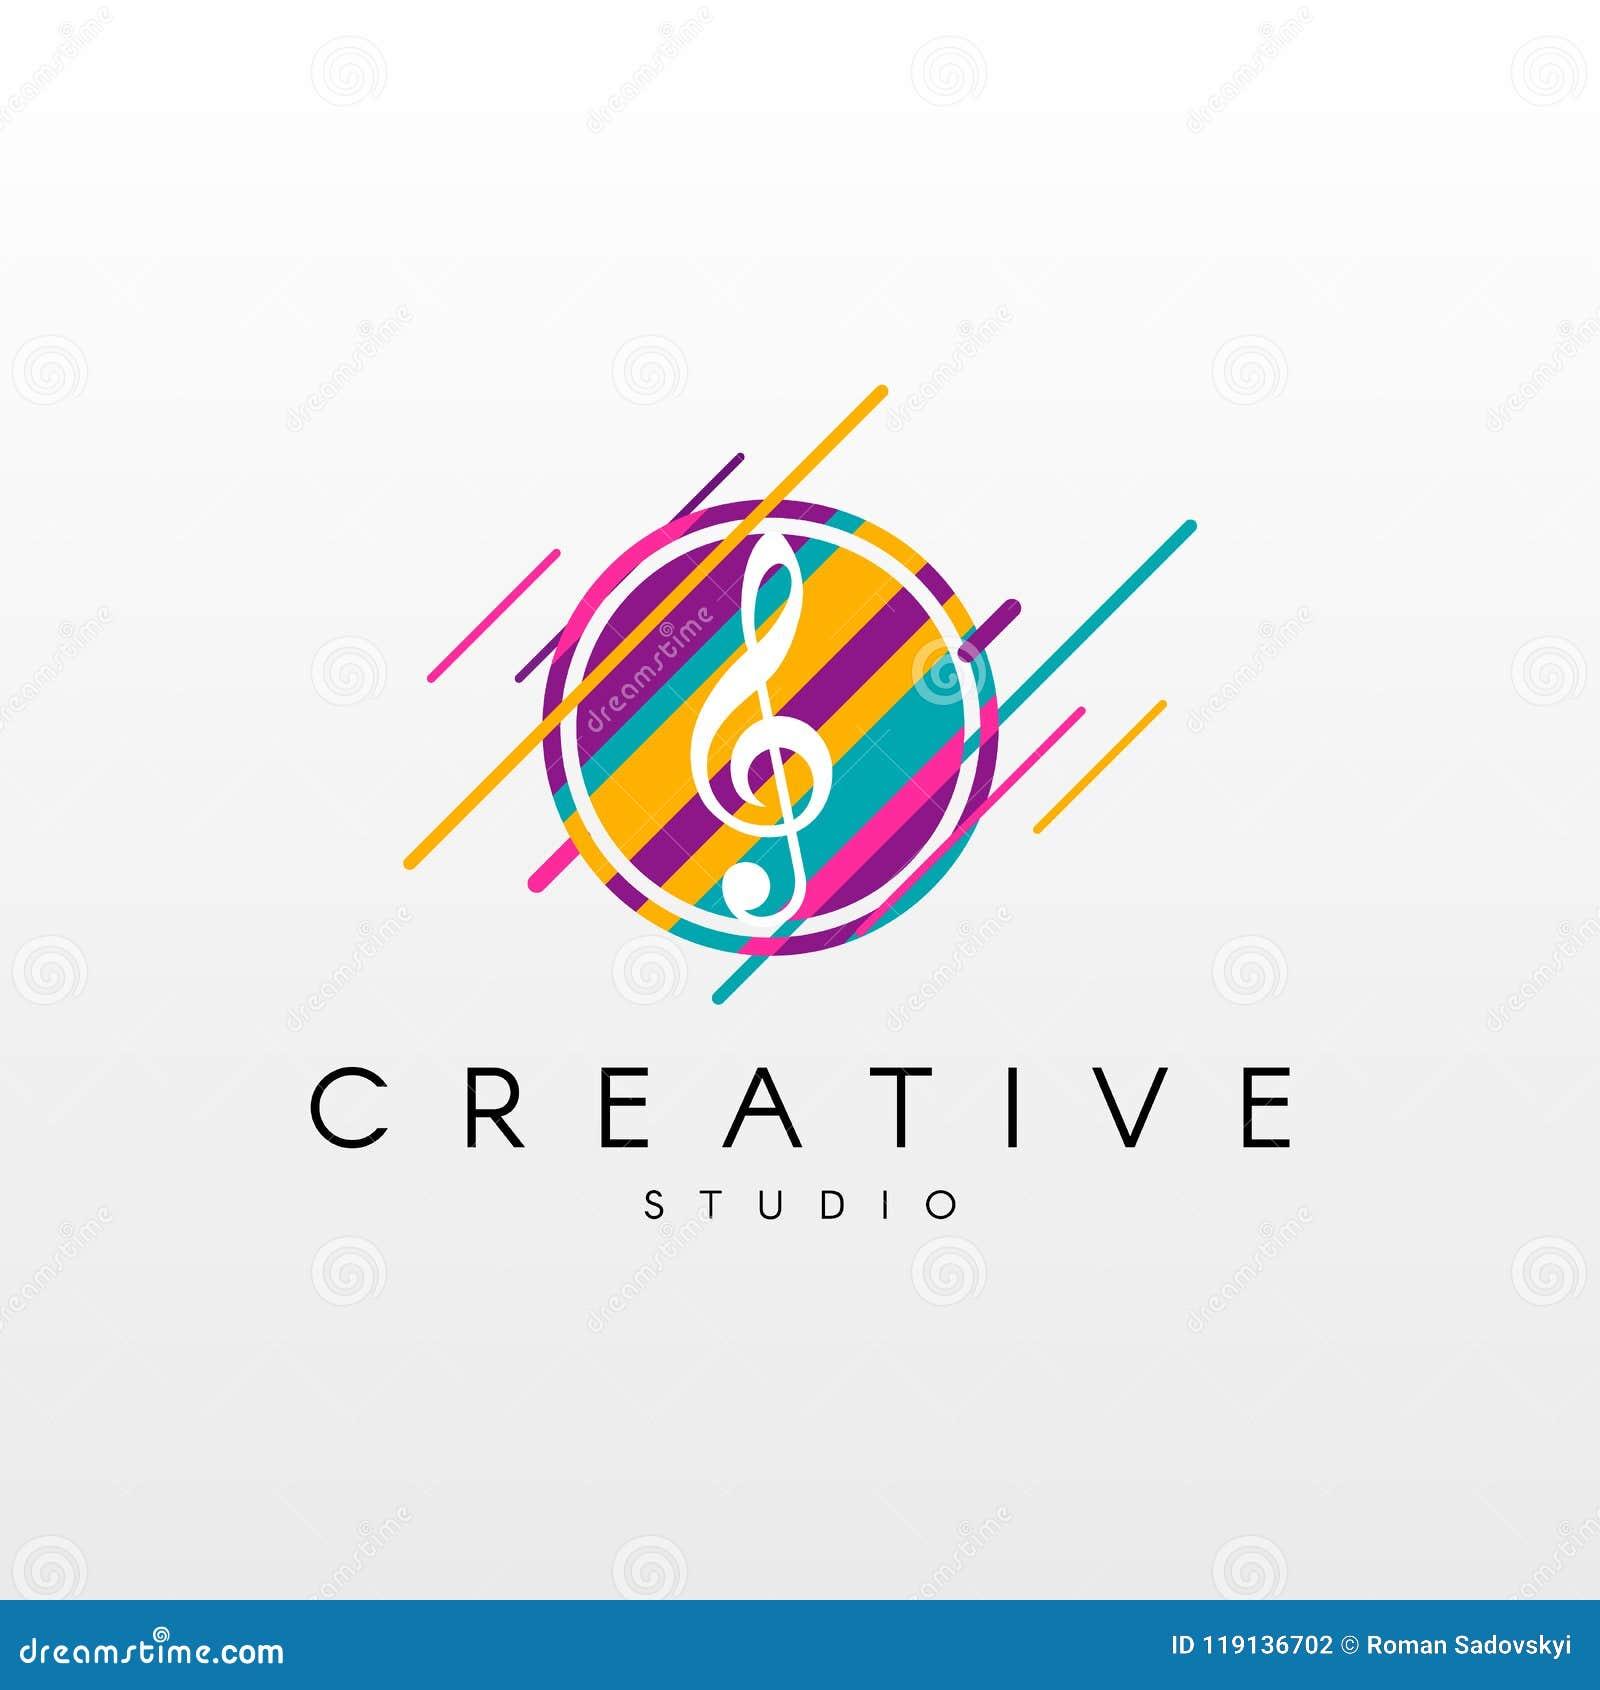 Music Logo  Logo Design, Made Of Various Geometric Shapes In